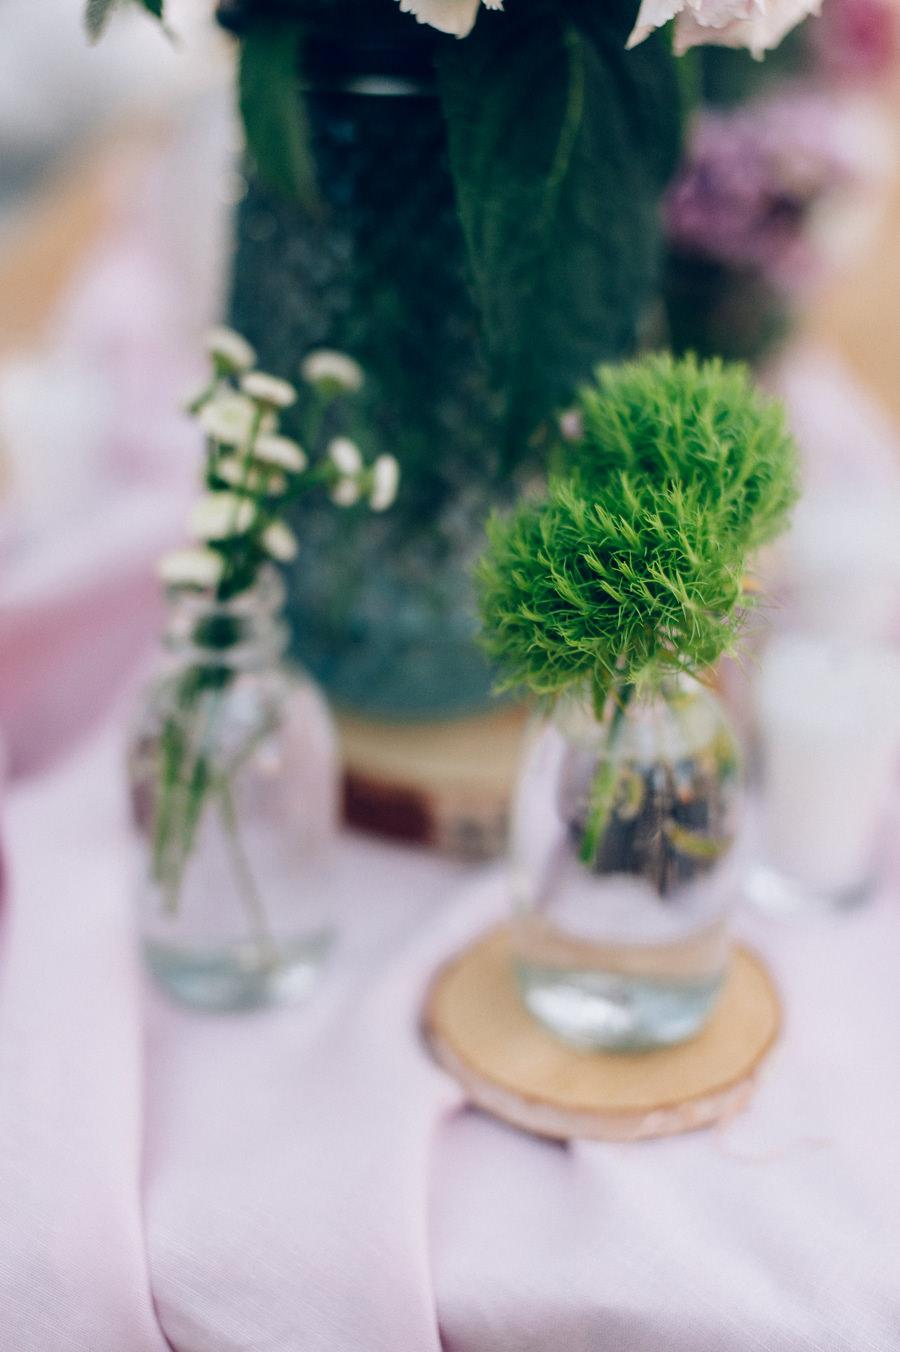 Flores para decorar tipis chill out 8